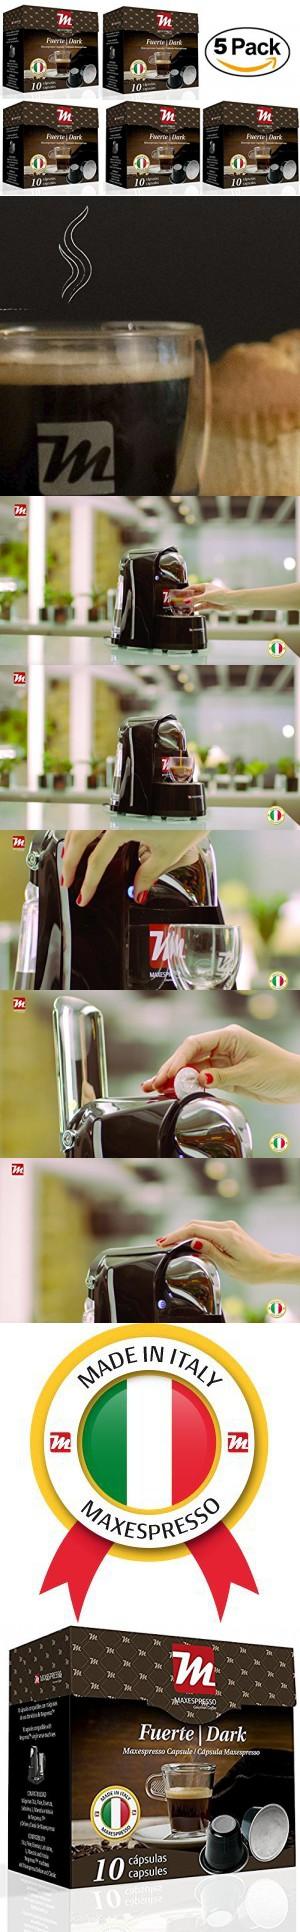 Nespresso Compatible Coffee Capsules, MaxEspresso Gourmet Coffee, Italian Quality (Dark - Fuerte, 50 Capsules)